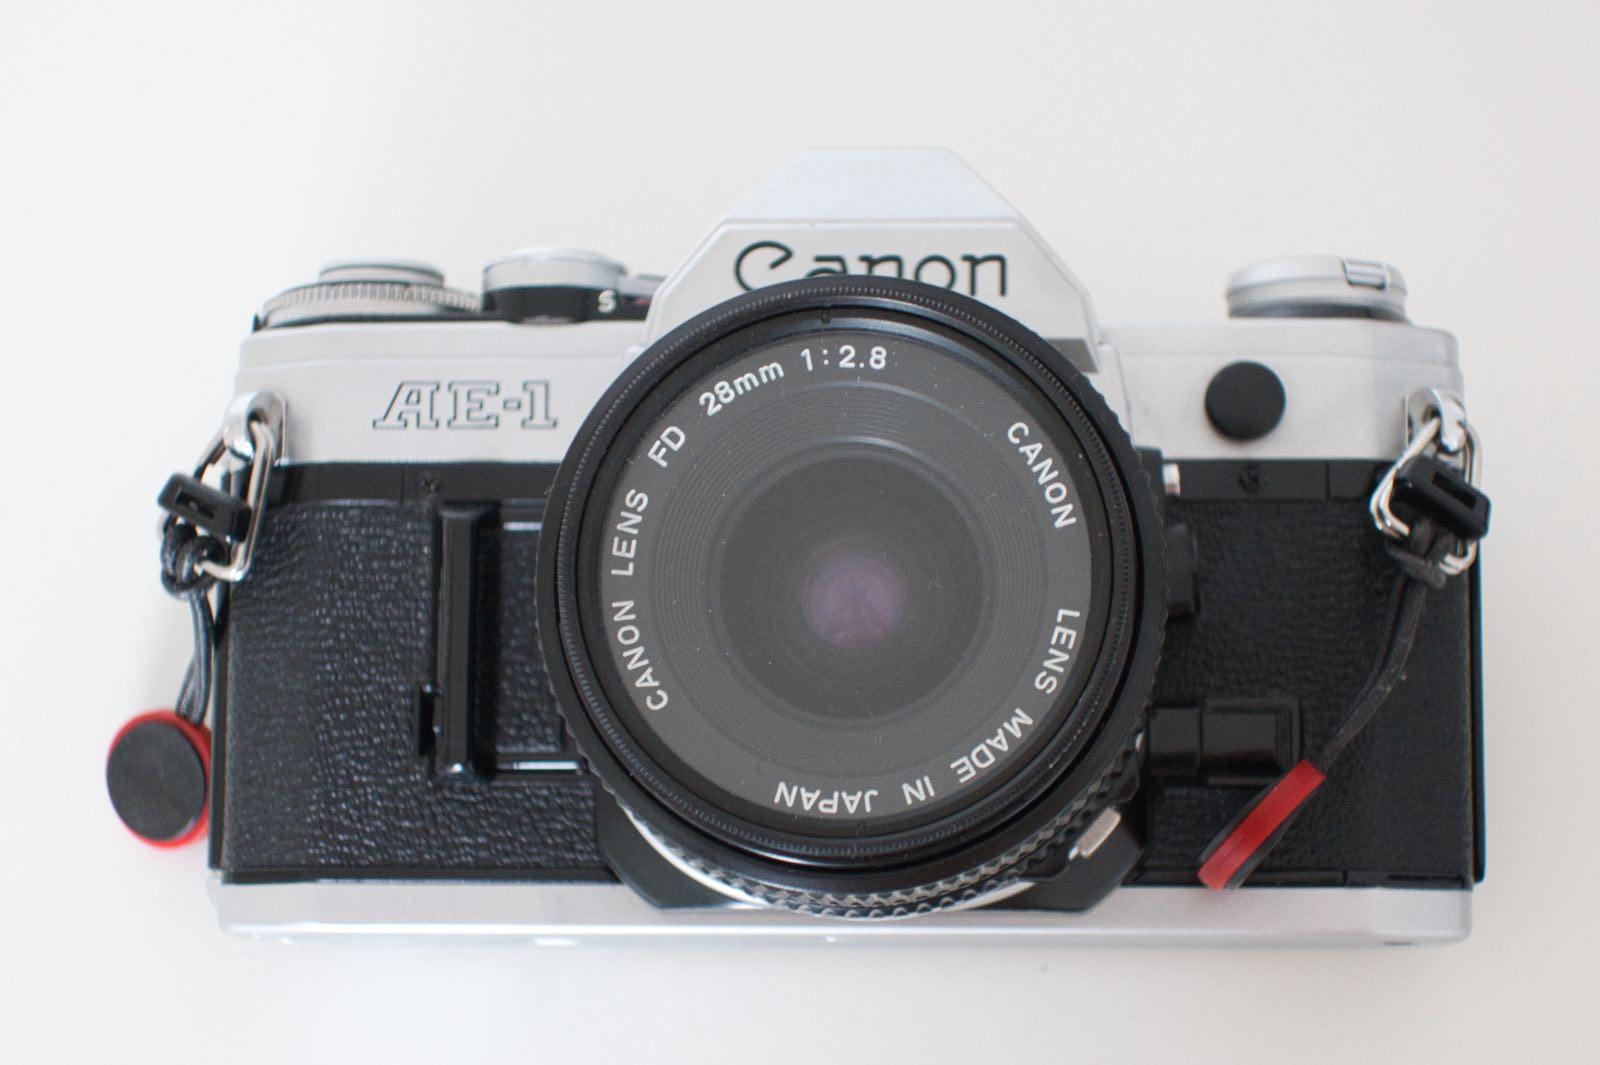 Die Canon AE-1, die beste manuelle und analoge Kamera